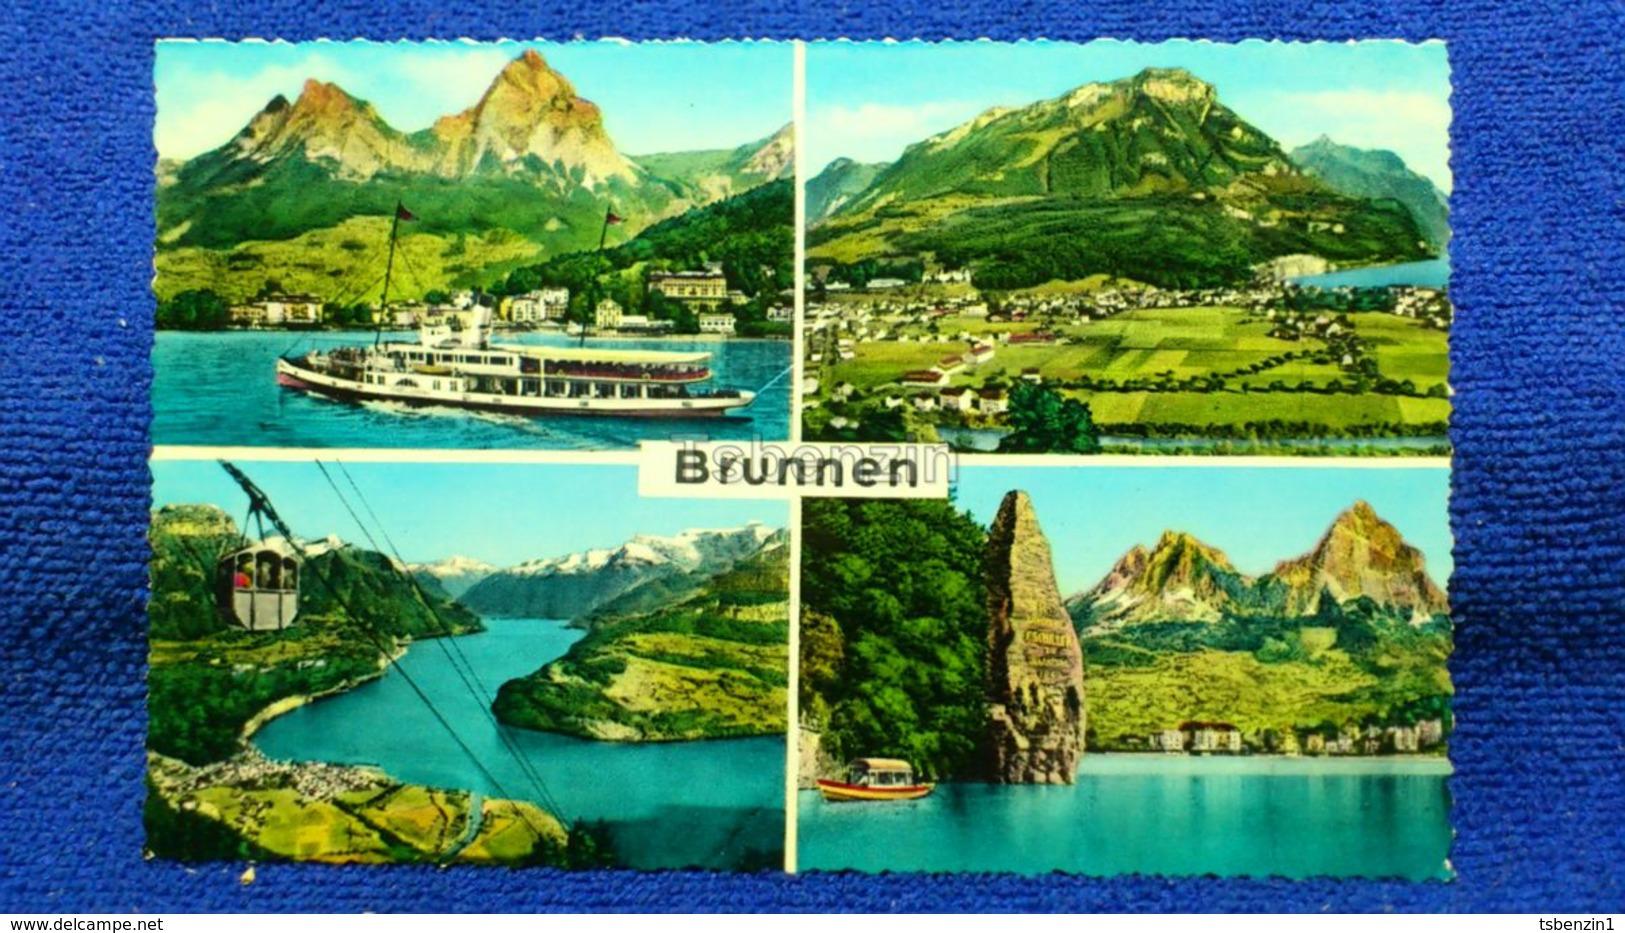 Brunnen Switzerland - Svizzera